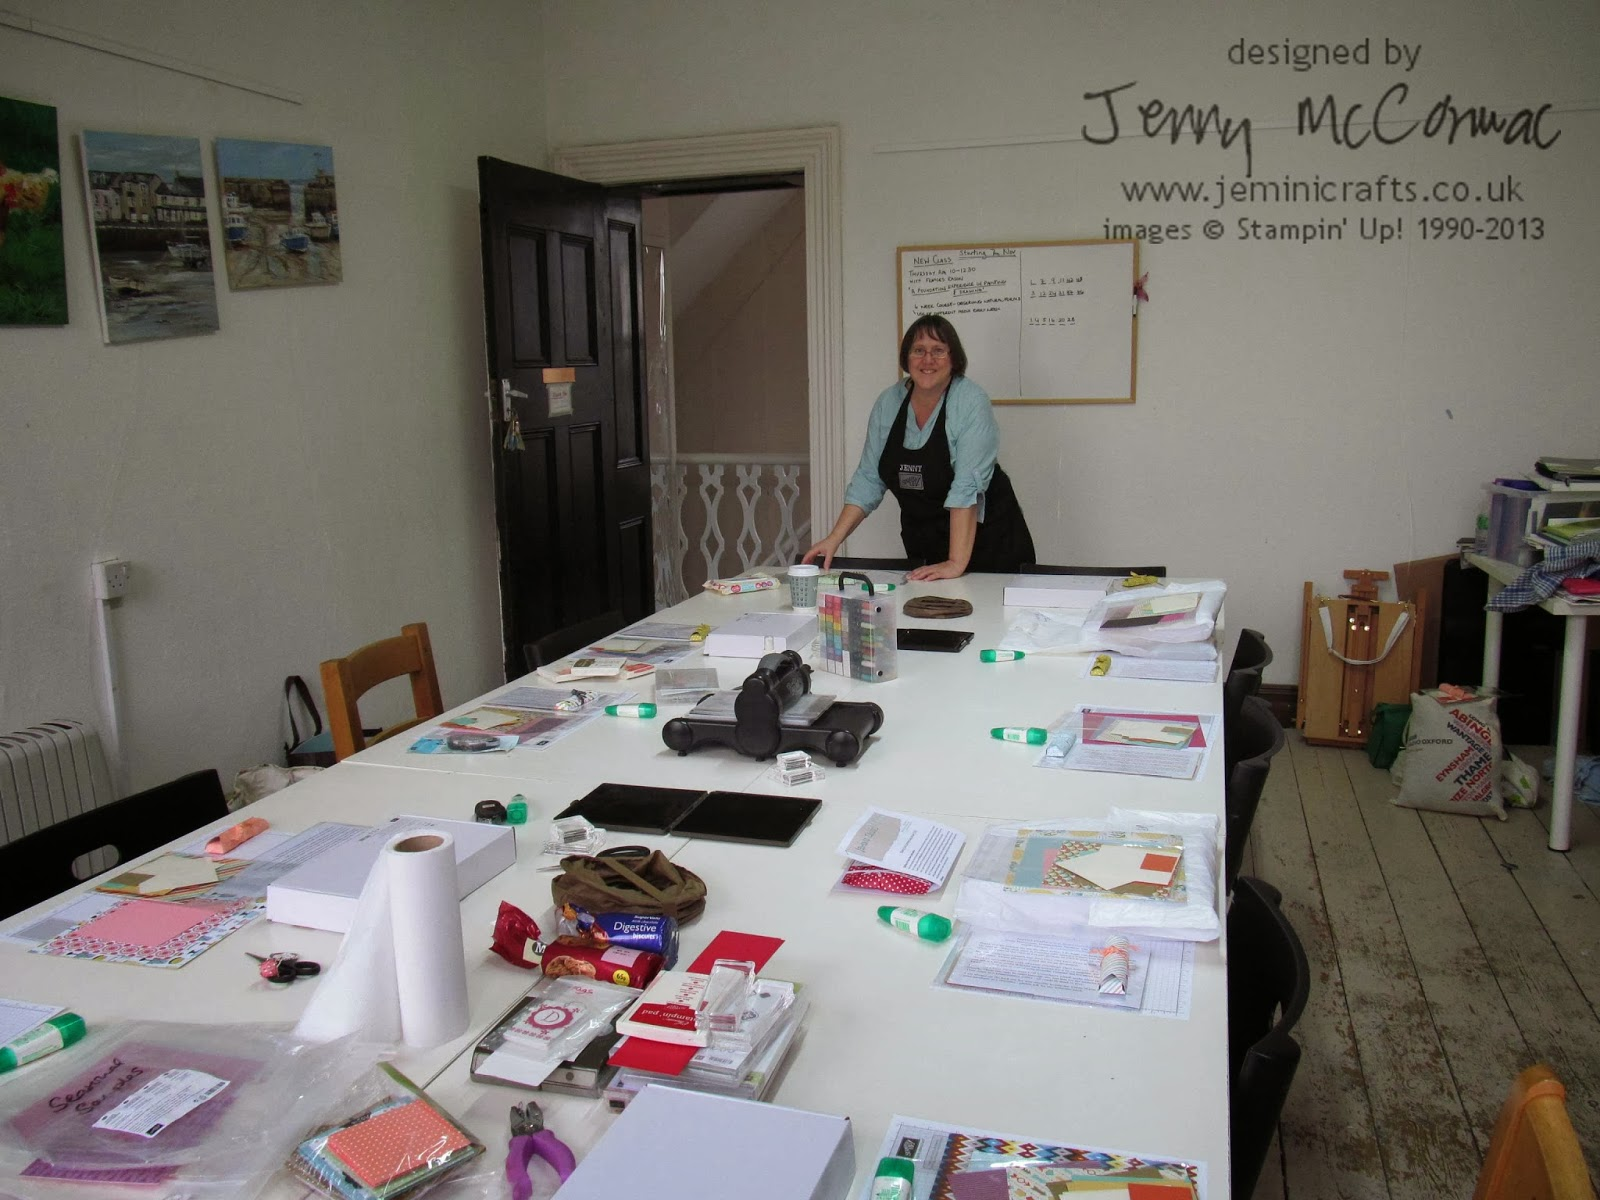 Card Class at Brackley. Stampin' Up! Jemini Crafts